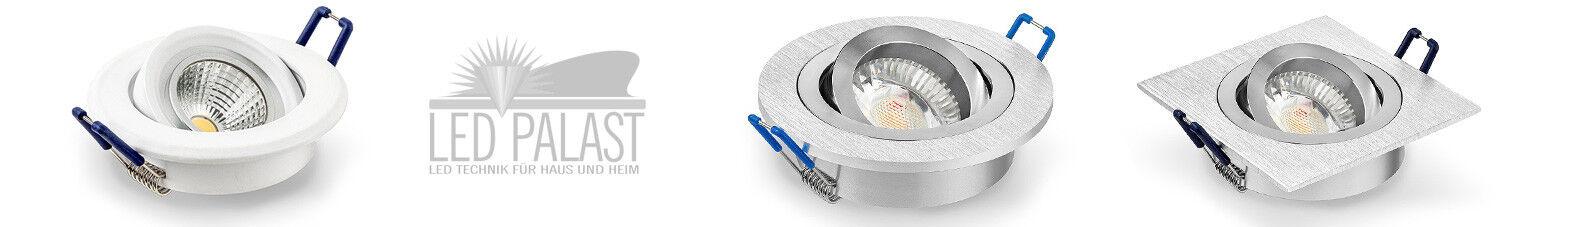 LED-Palast